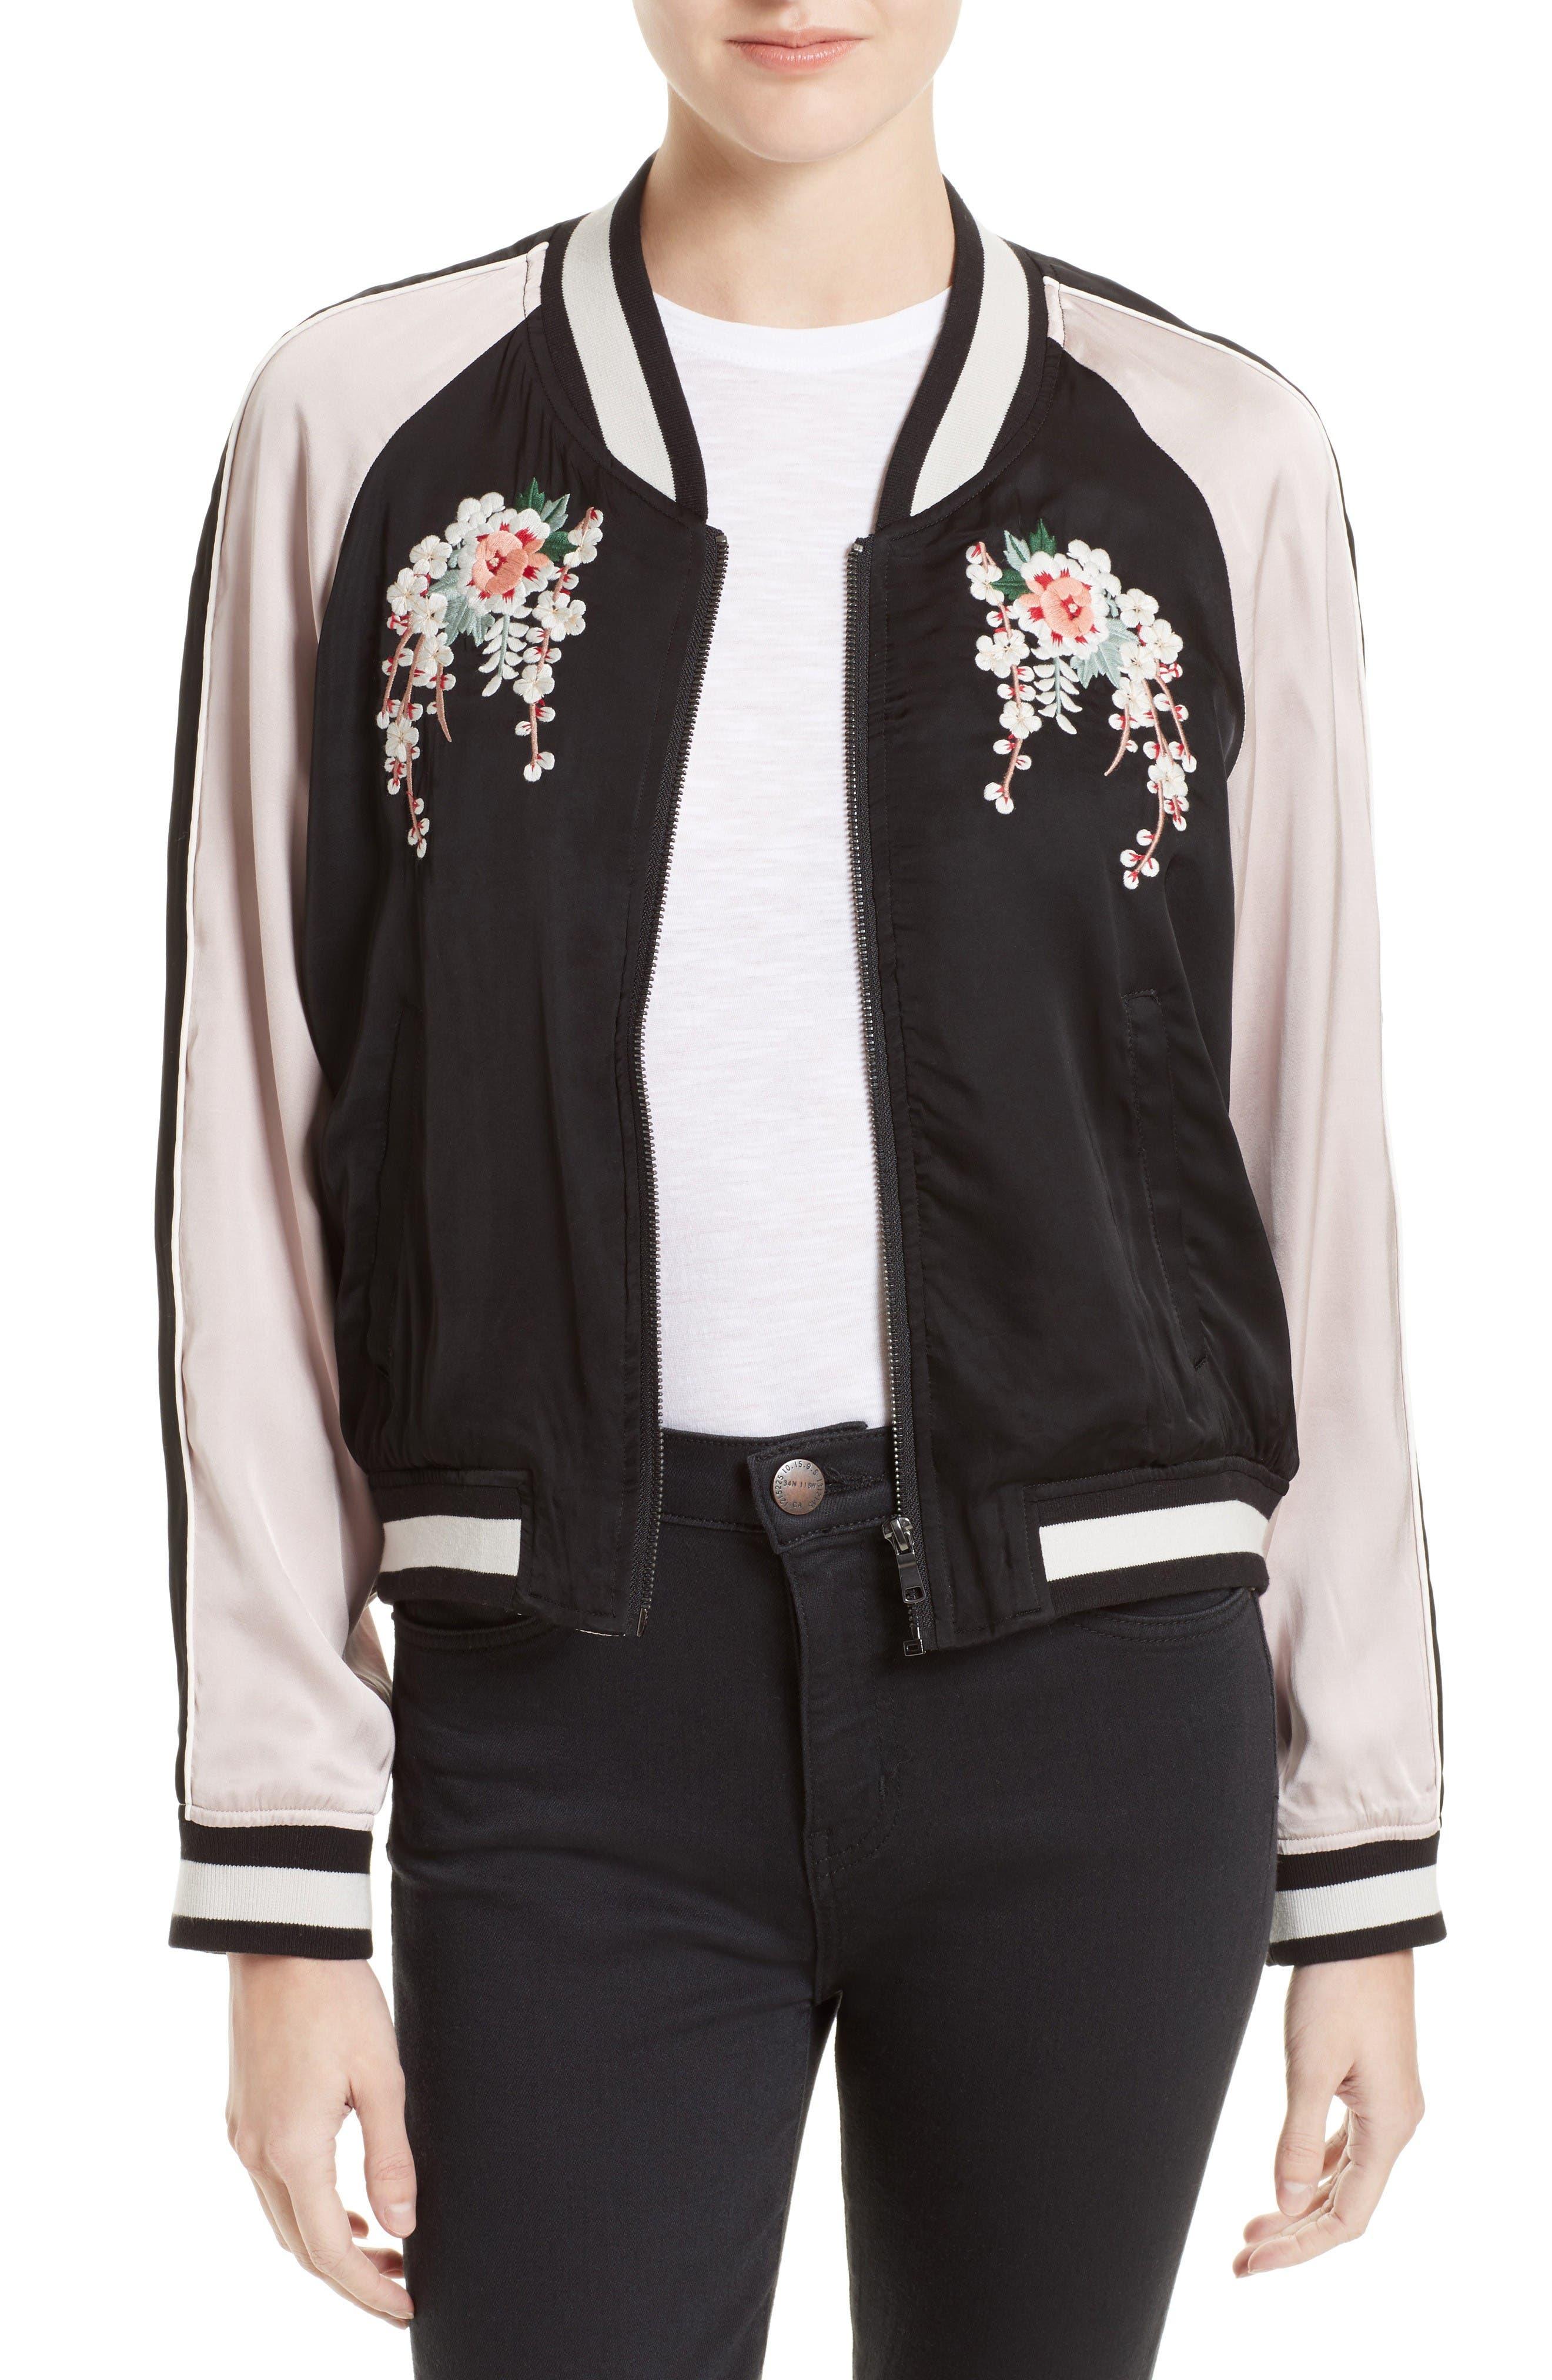 Main Image - Joie Juanita Embroidered Bomber Jacket